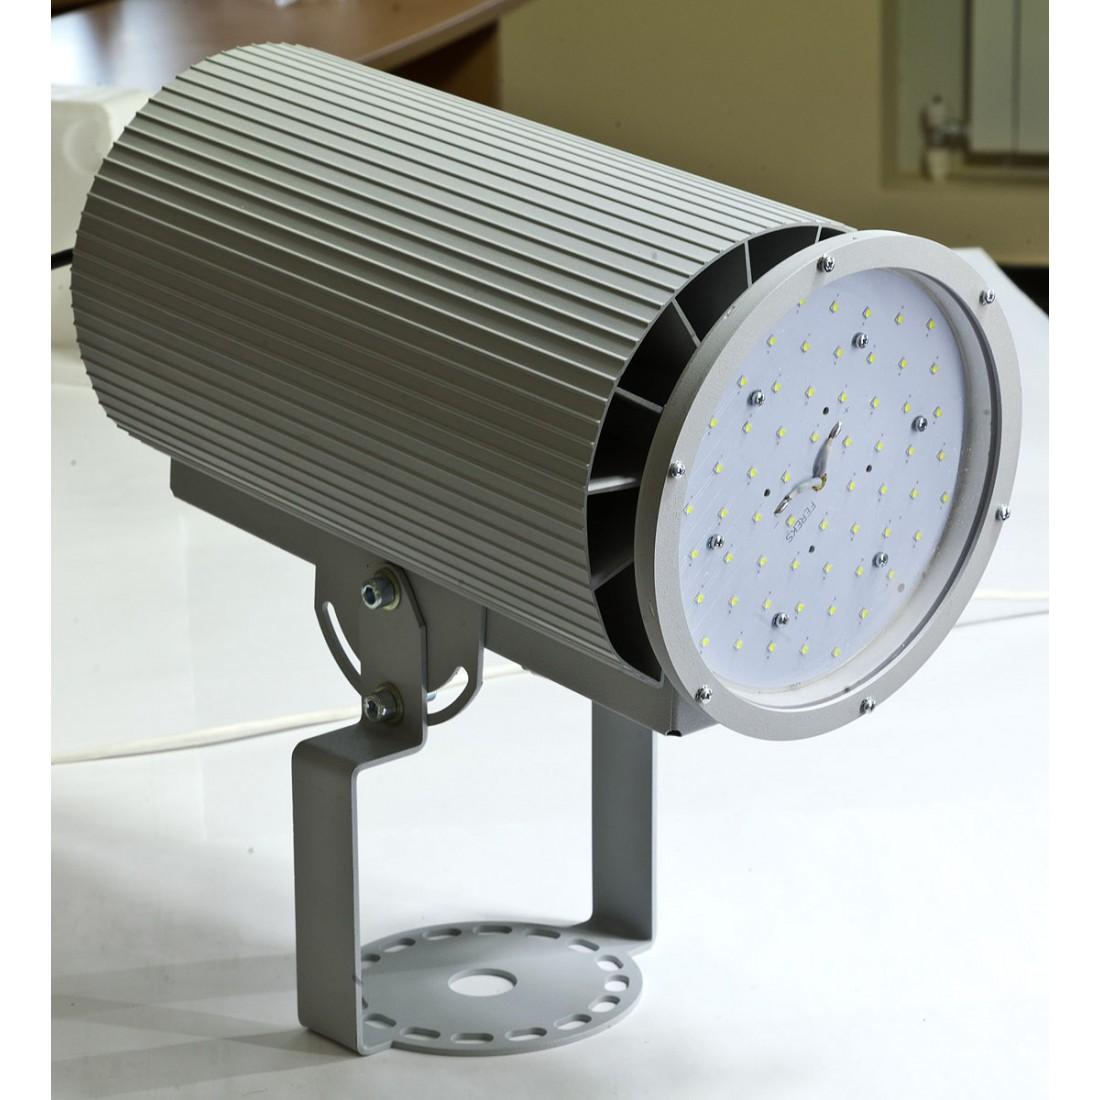 Светильник ДСП 27-70-50-К40 (на кронштейне)